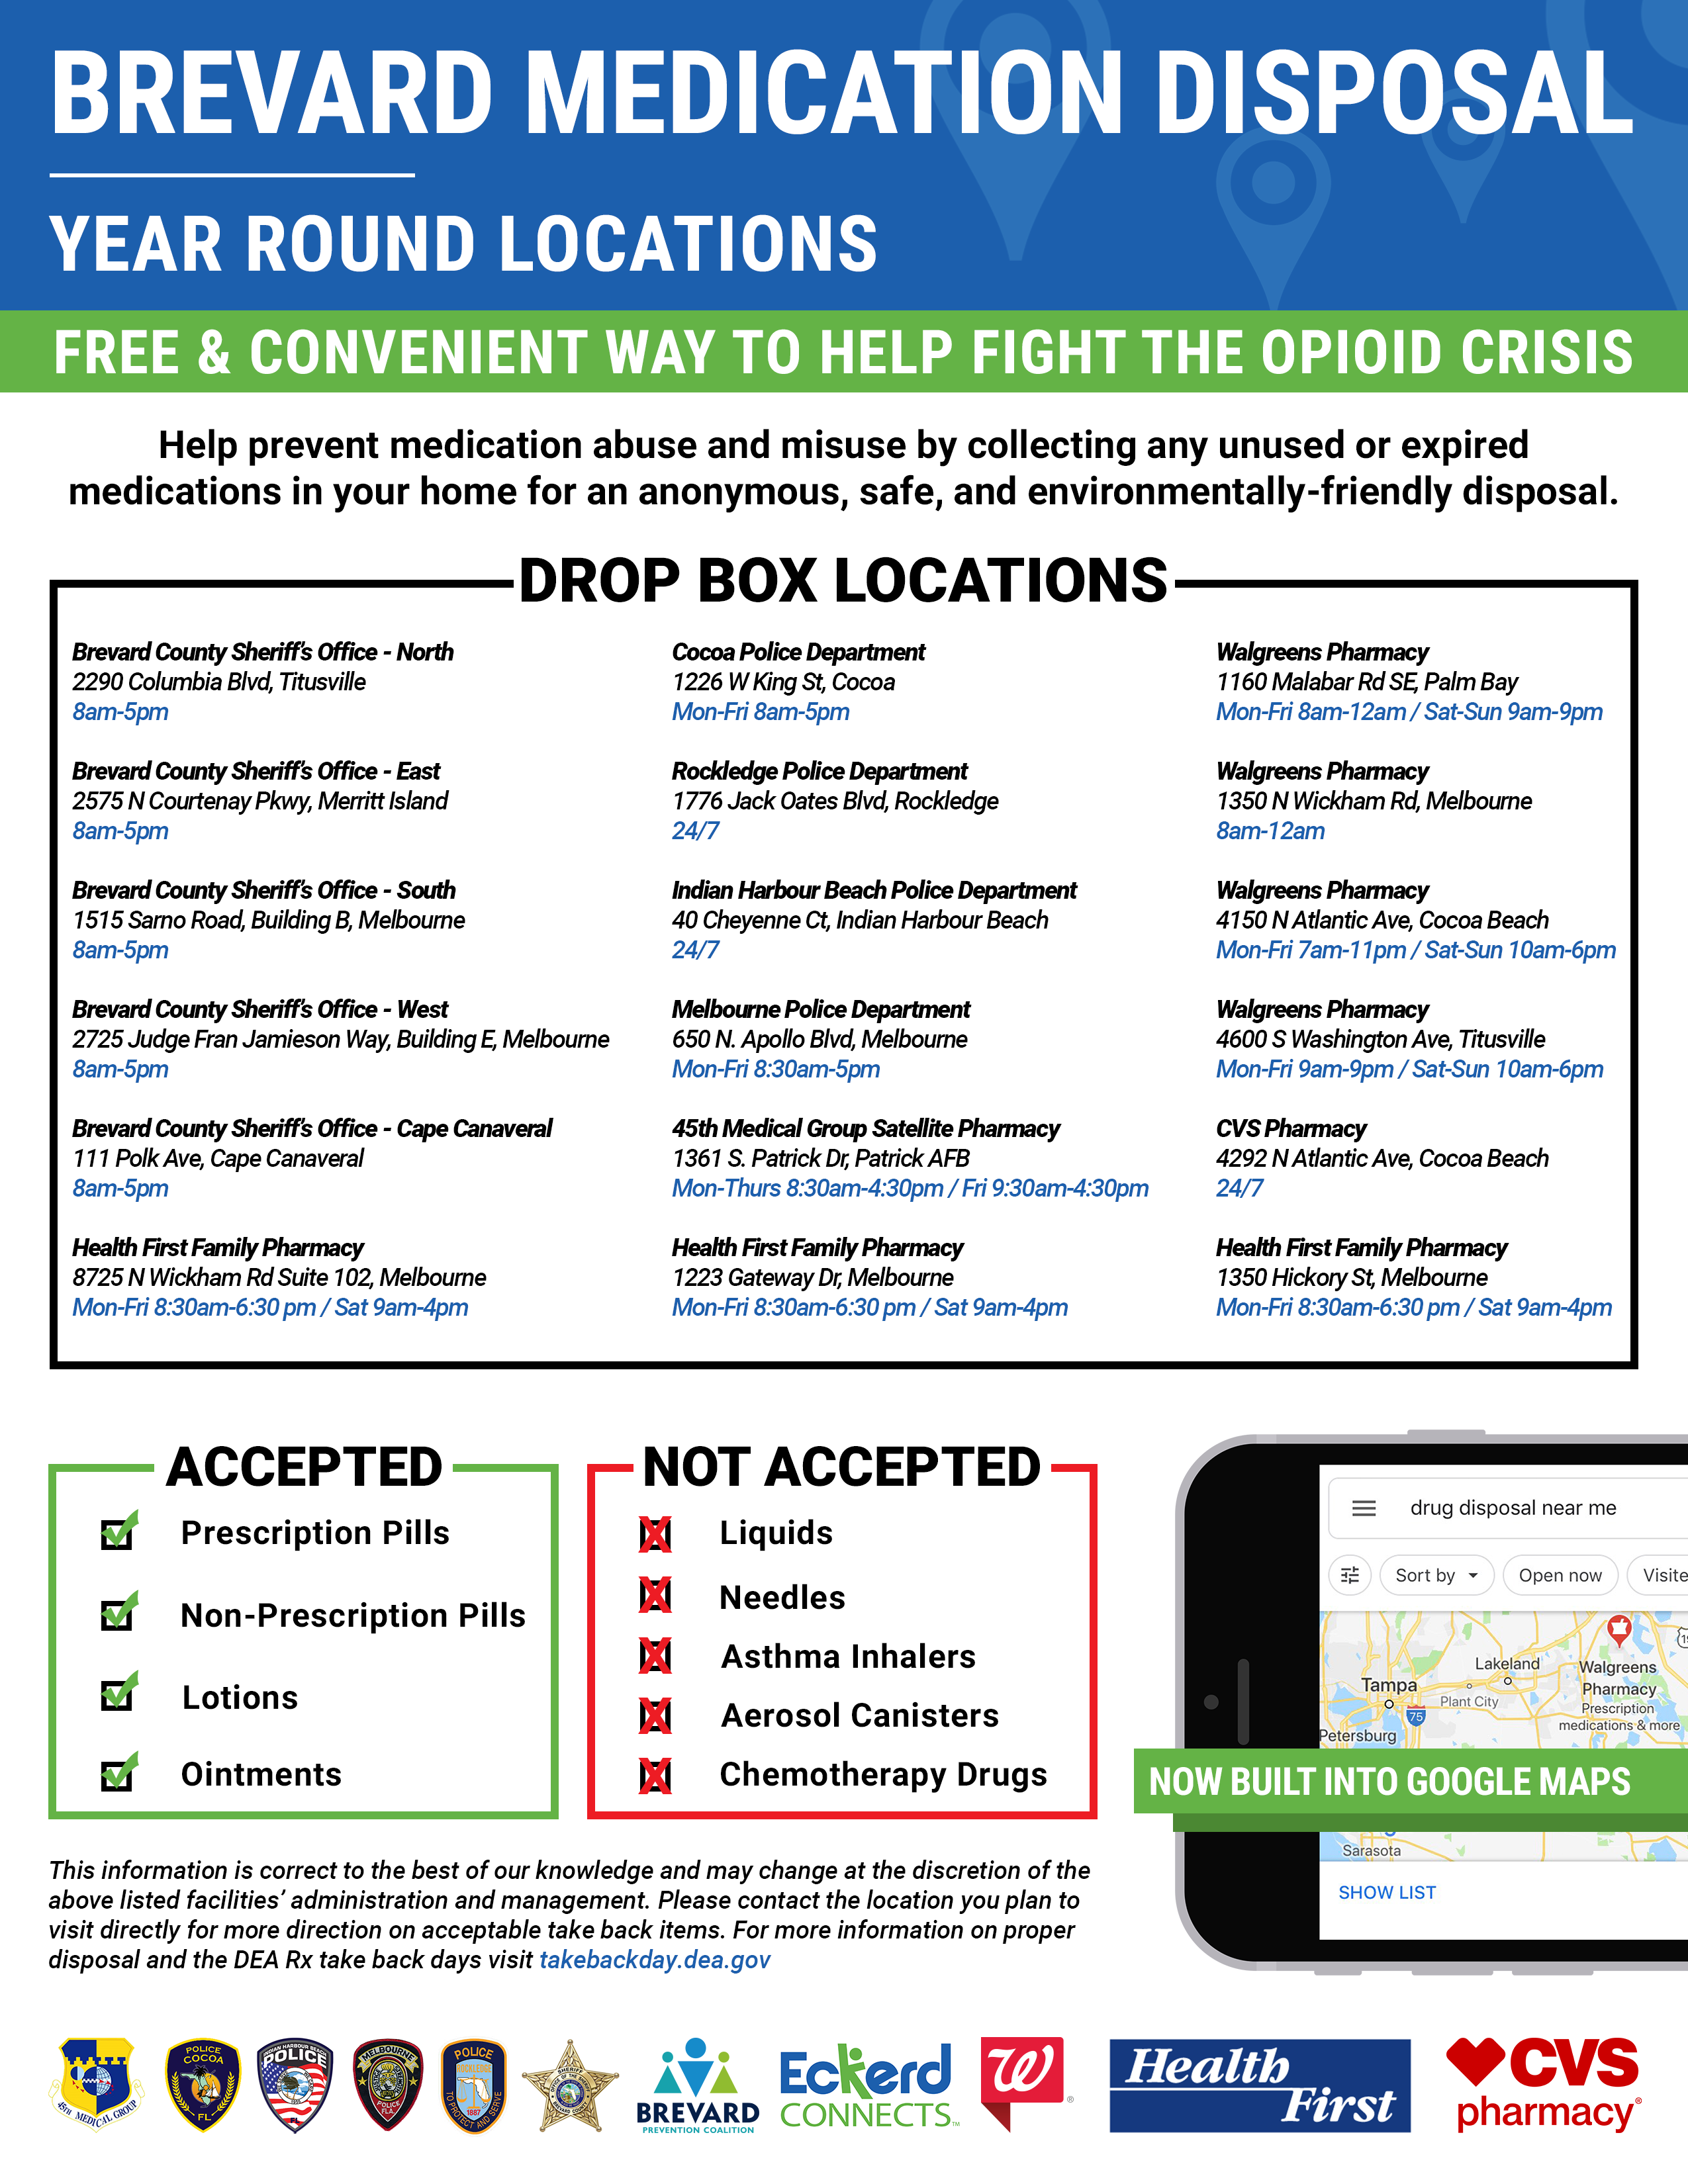 Brevard Drug Disposal Locations